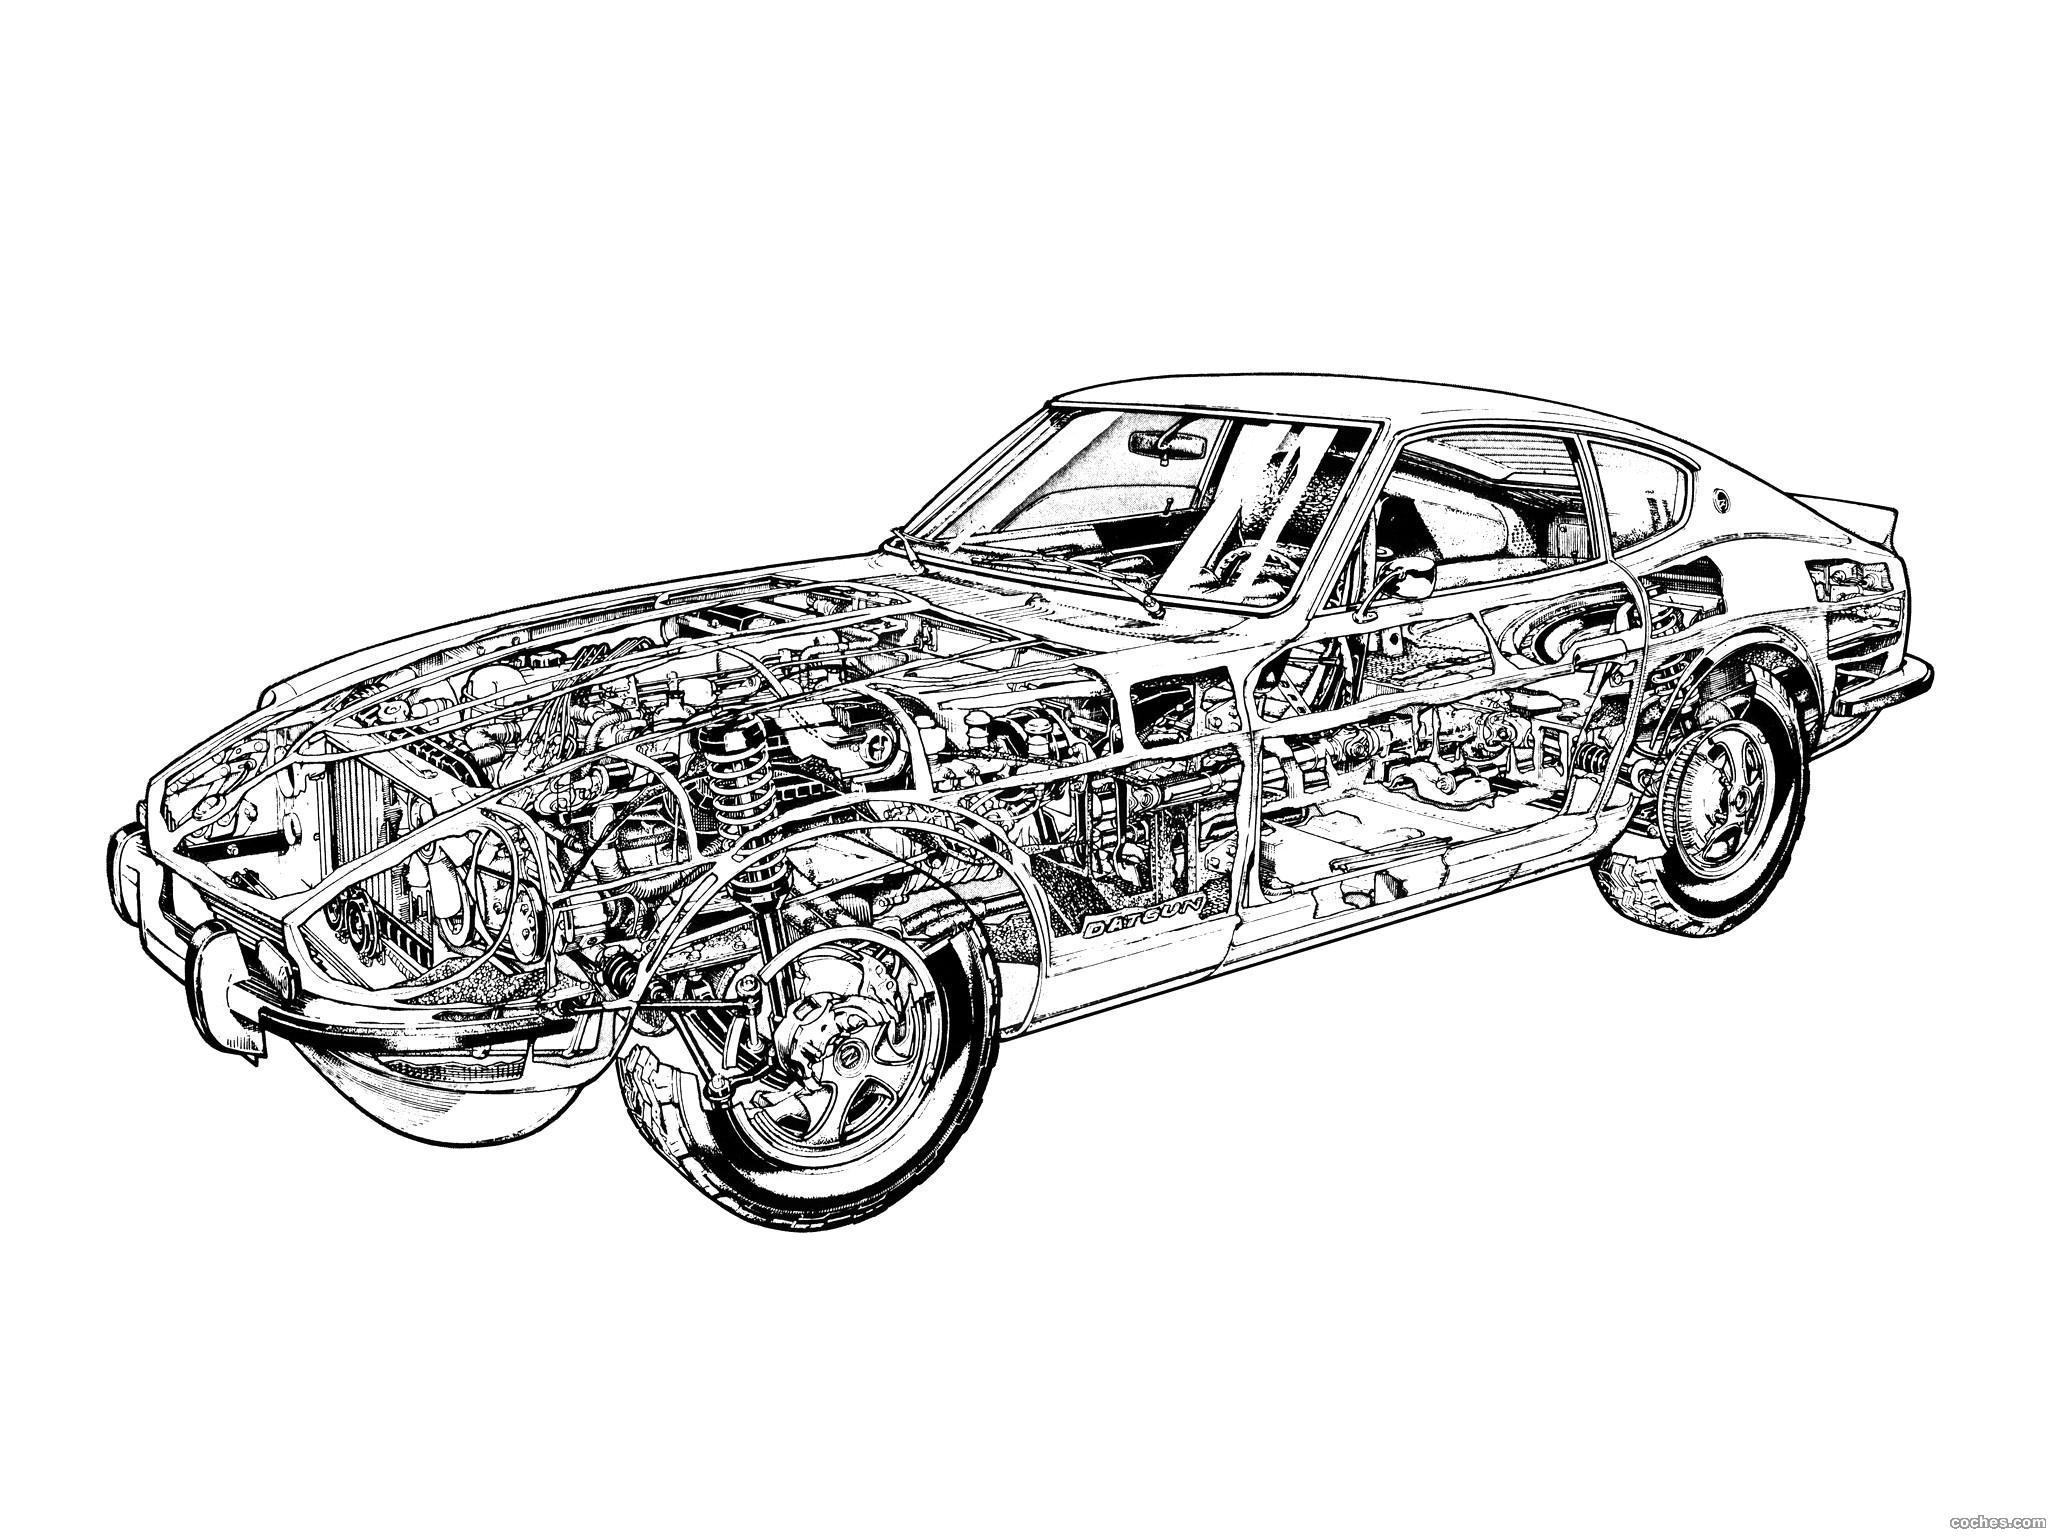 Foto 12 de Datsun 240Z HS30 1969